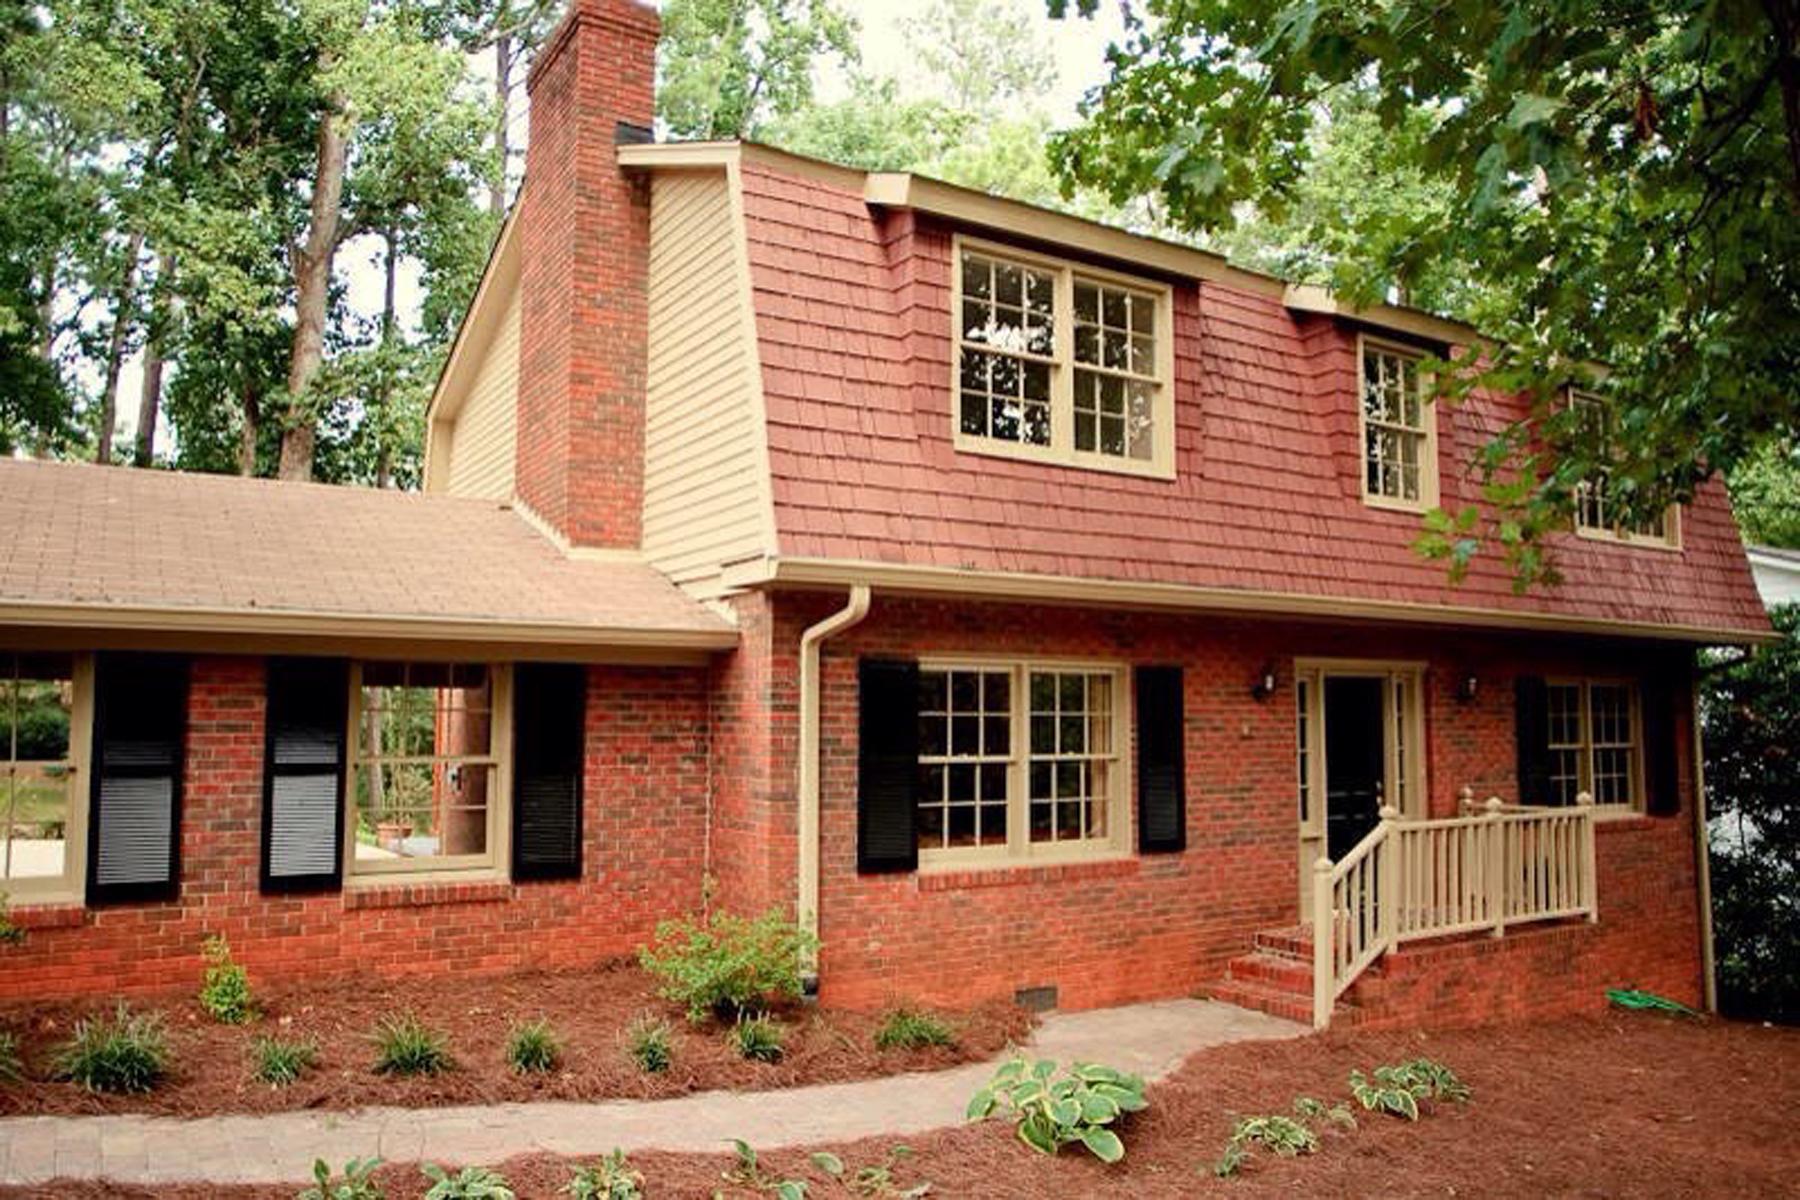 Einfamilienhaus für Verkauf beim Adorable Move-in Ready Home In A Fabulous Location Awaits You 7221 Duncourtney Drive Atlanta, Georgia, 30328 Vereinigte Staaten